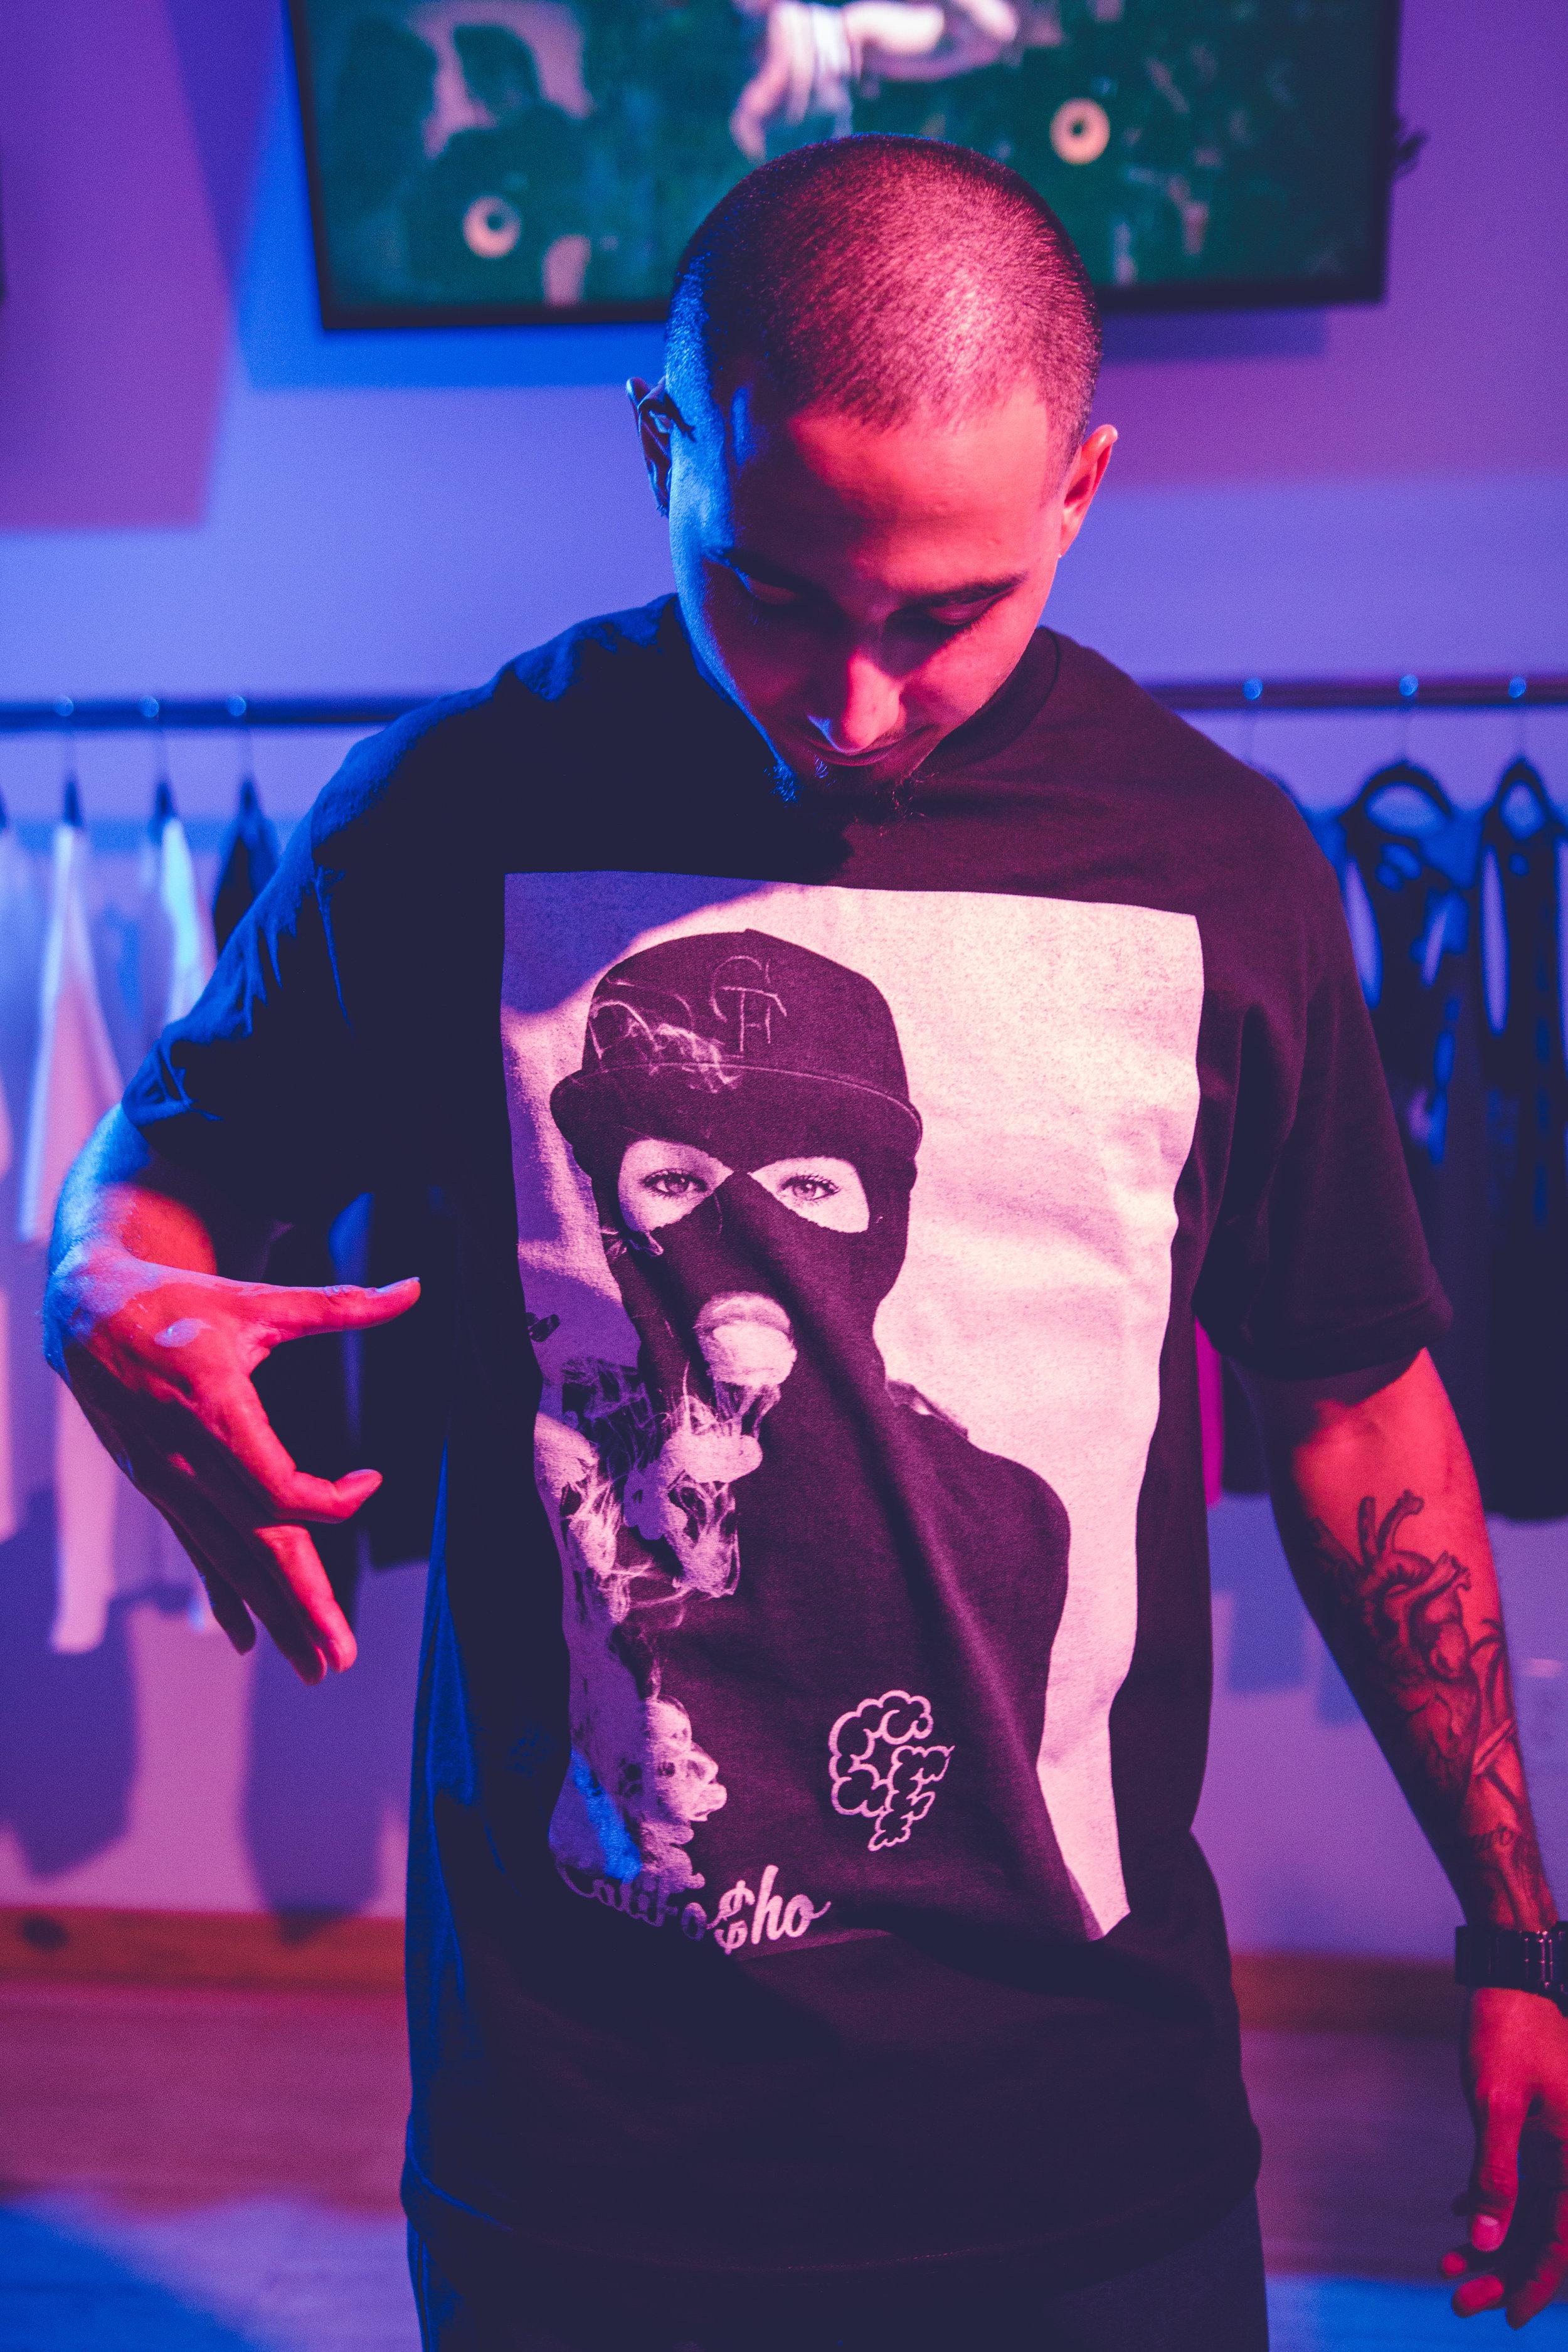 Cali Fosho Smoke Box New T Shirt Shoot at The Shop-9508.jpg